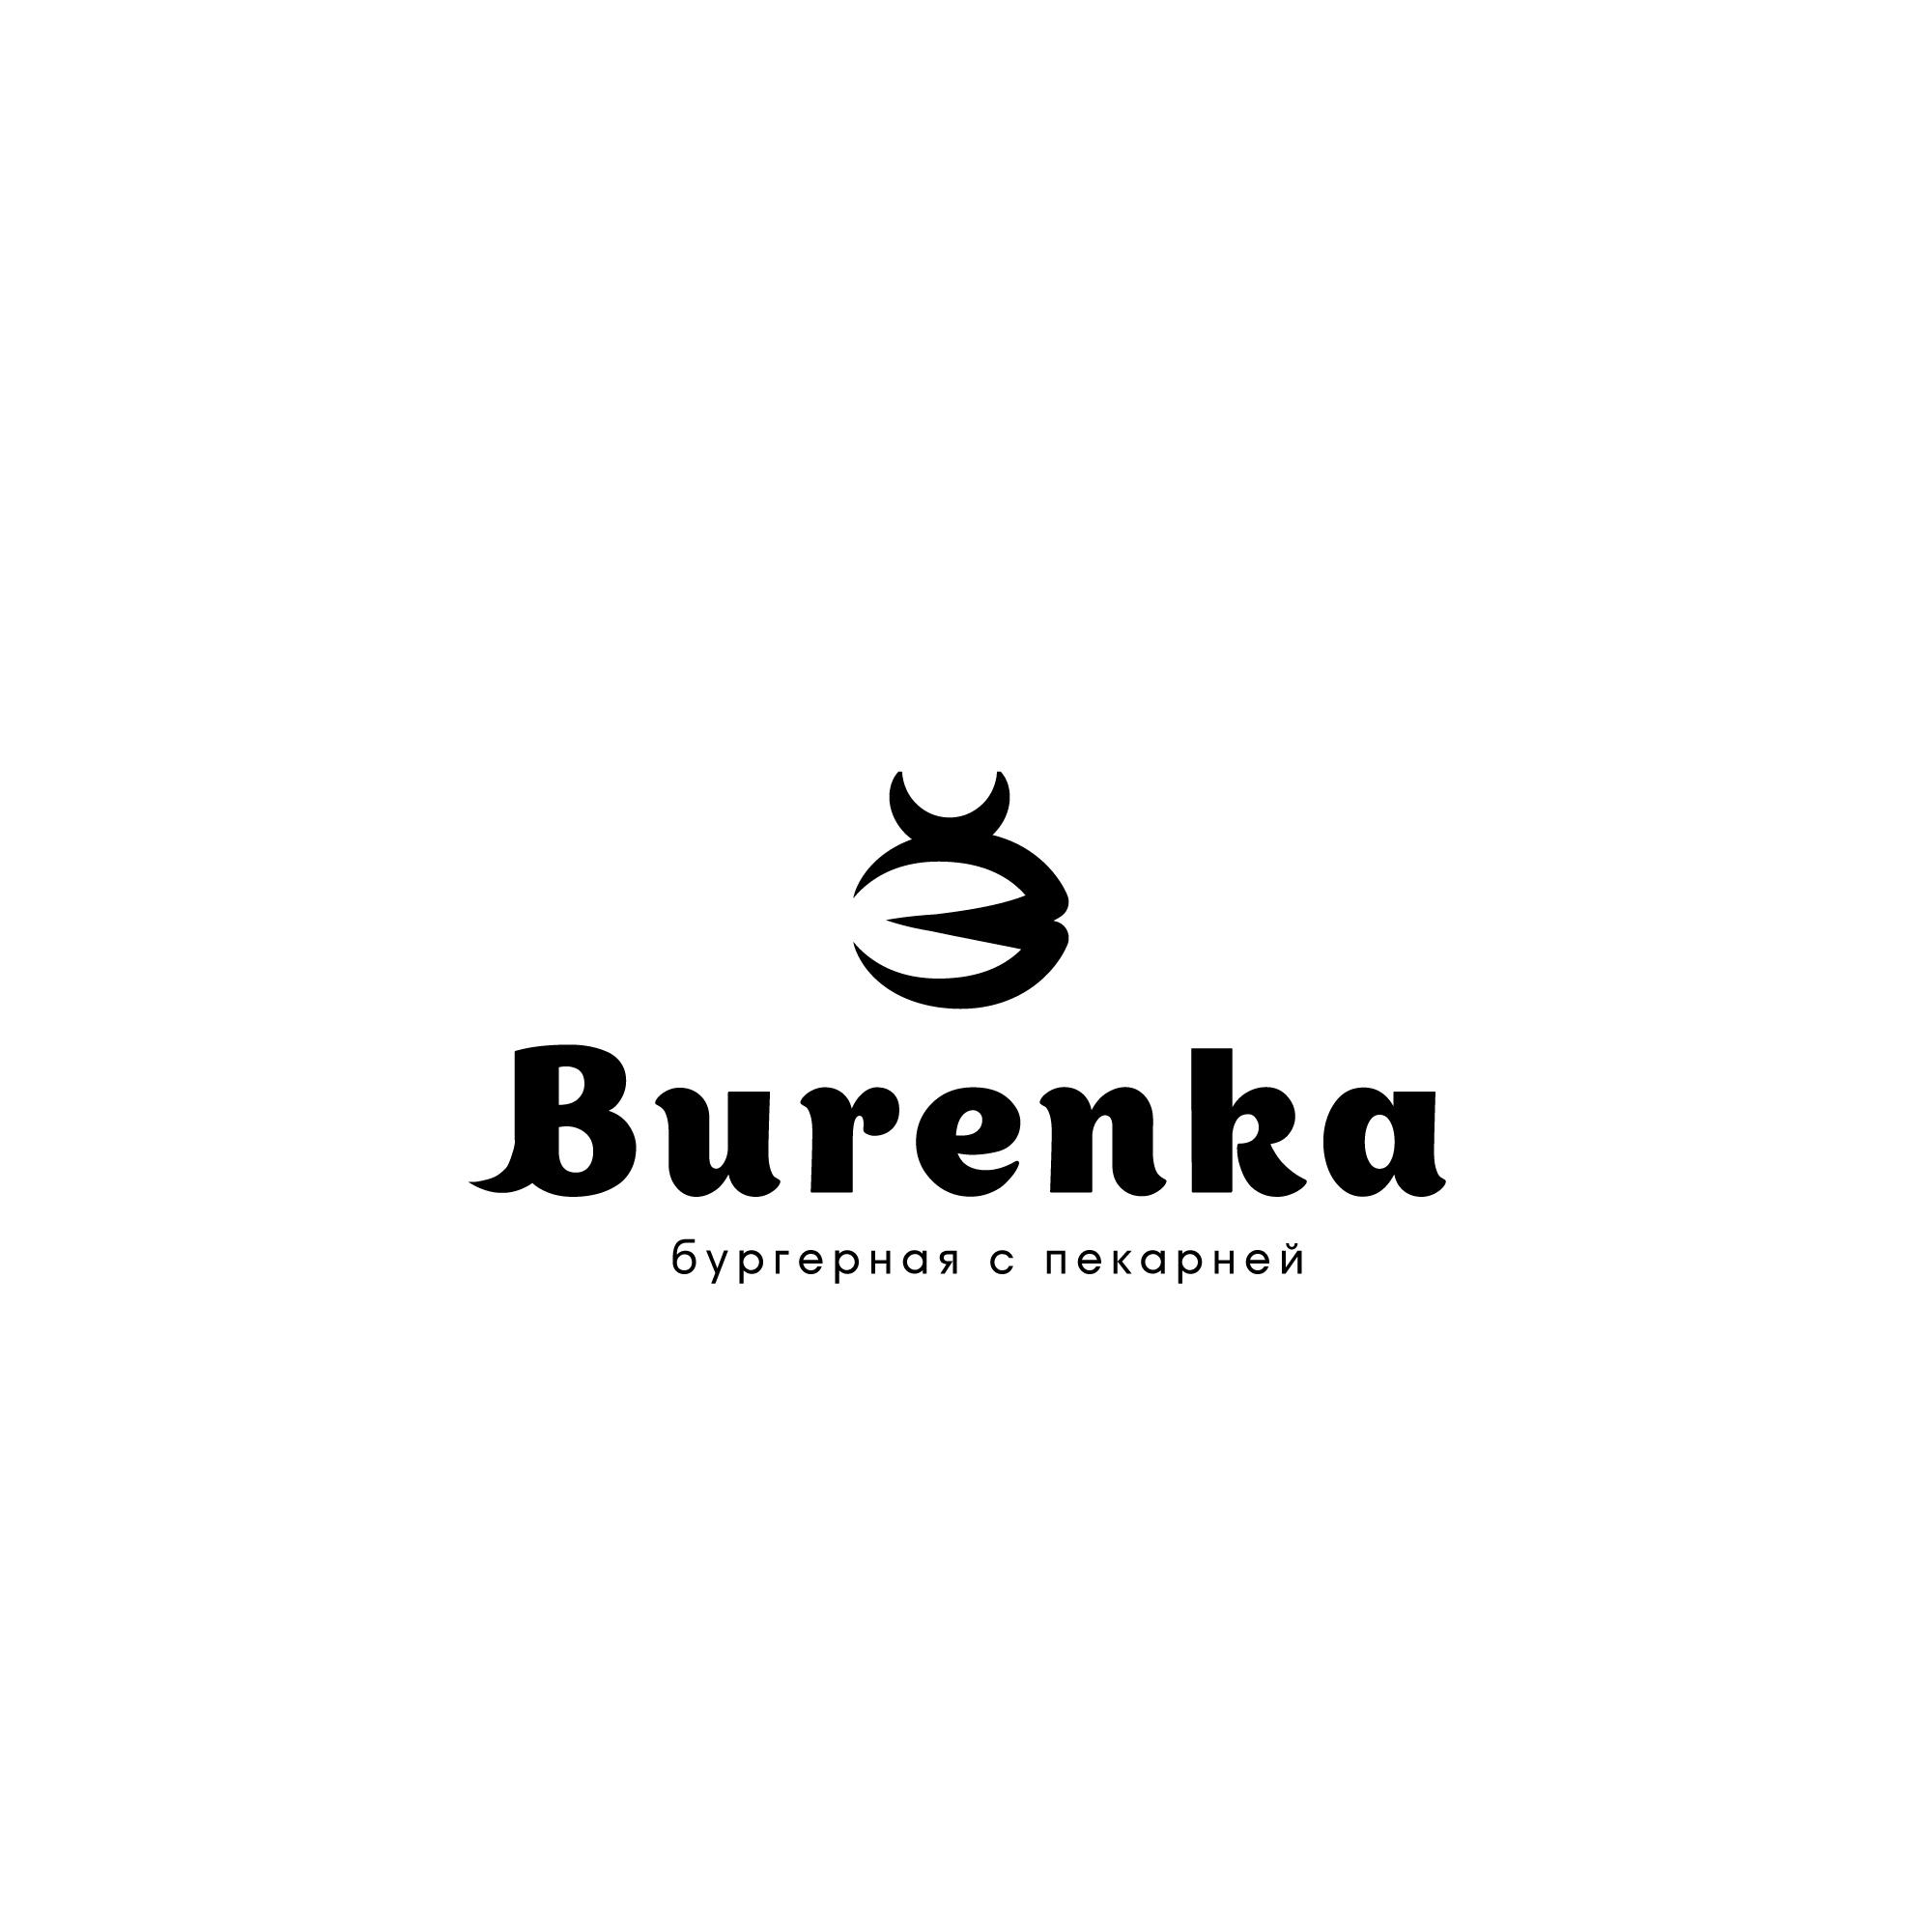 Логотип для Бургерной с Пекарней фото f_9385e1b7e559cd9b.jpg